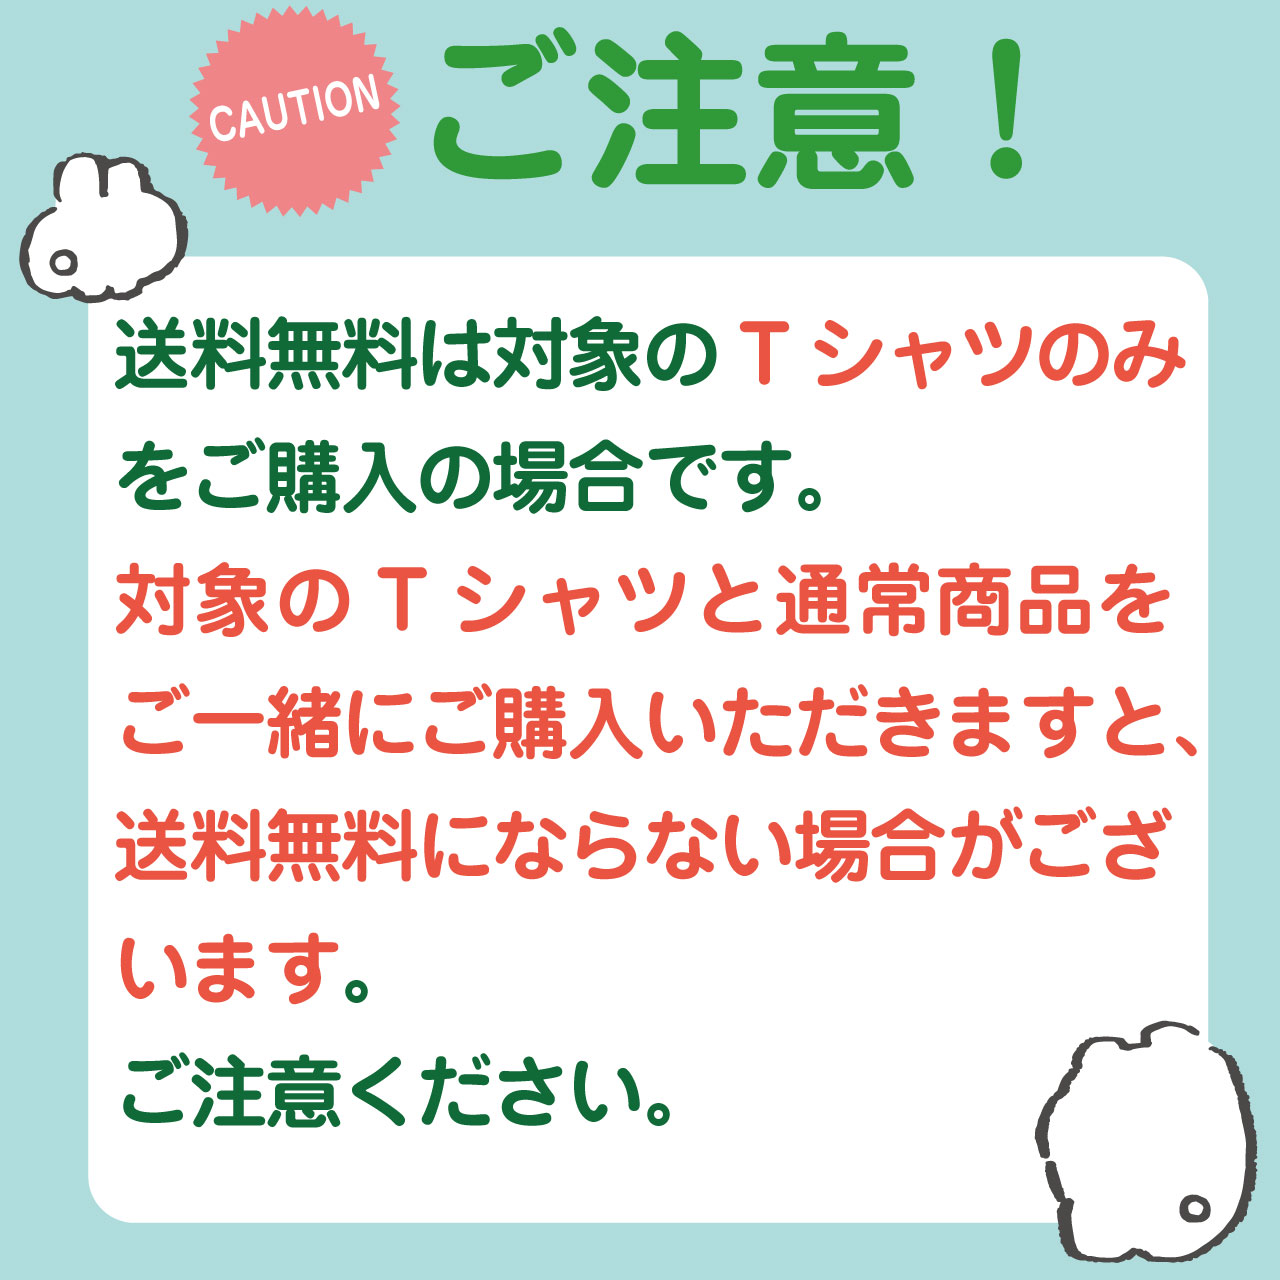 【7/17~7/31】Tシャツフェア第二弾開催